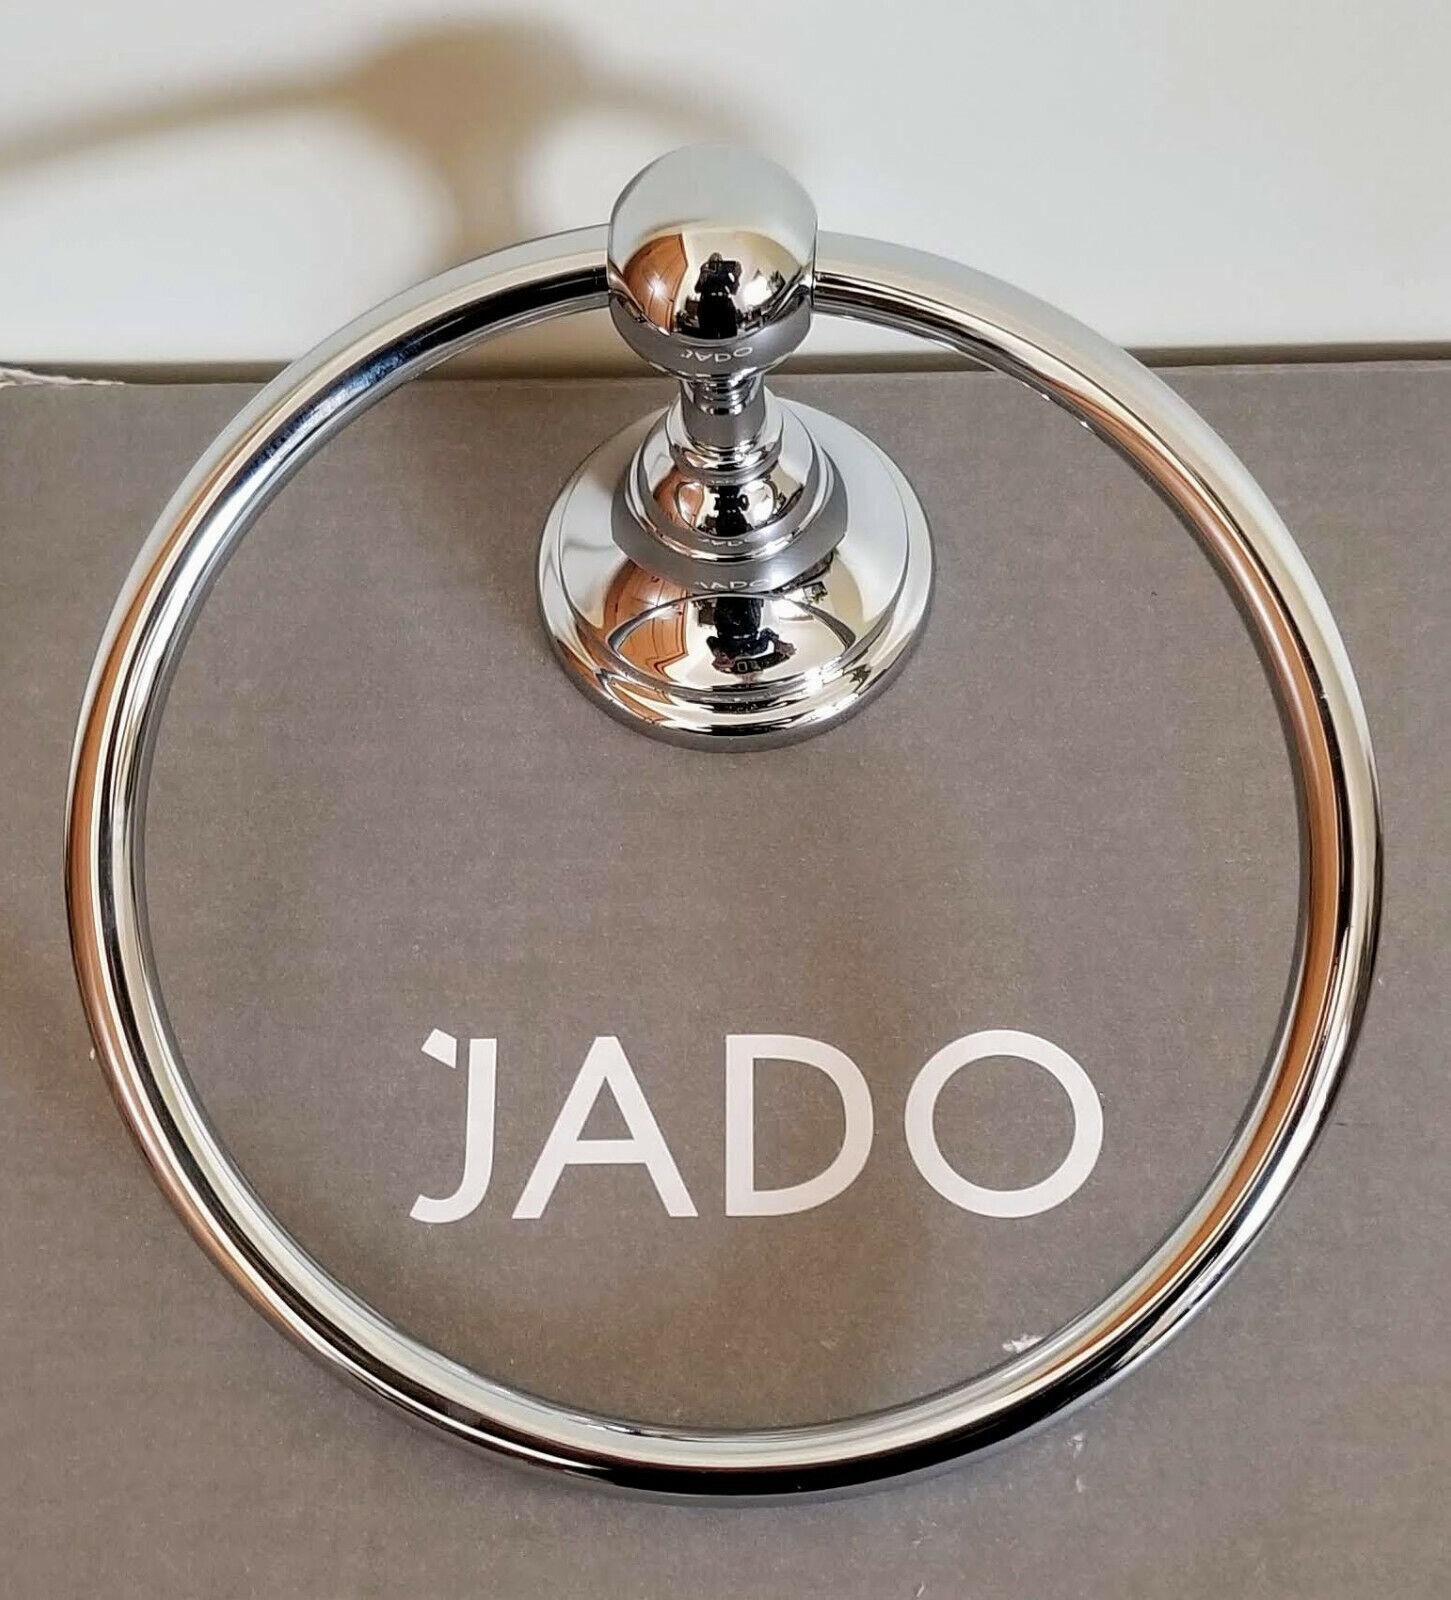 Jado Hatteras 6 inch Towel Ring 042/150/100 Polished Chrome